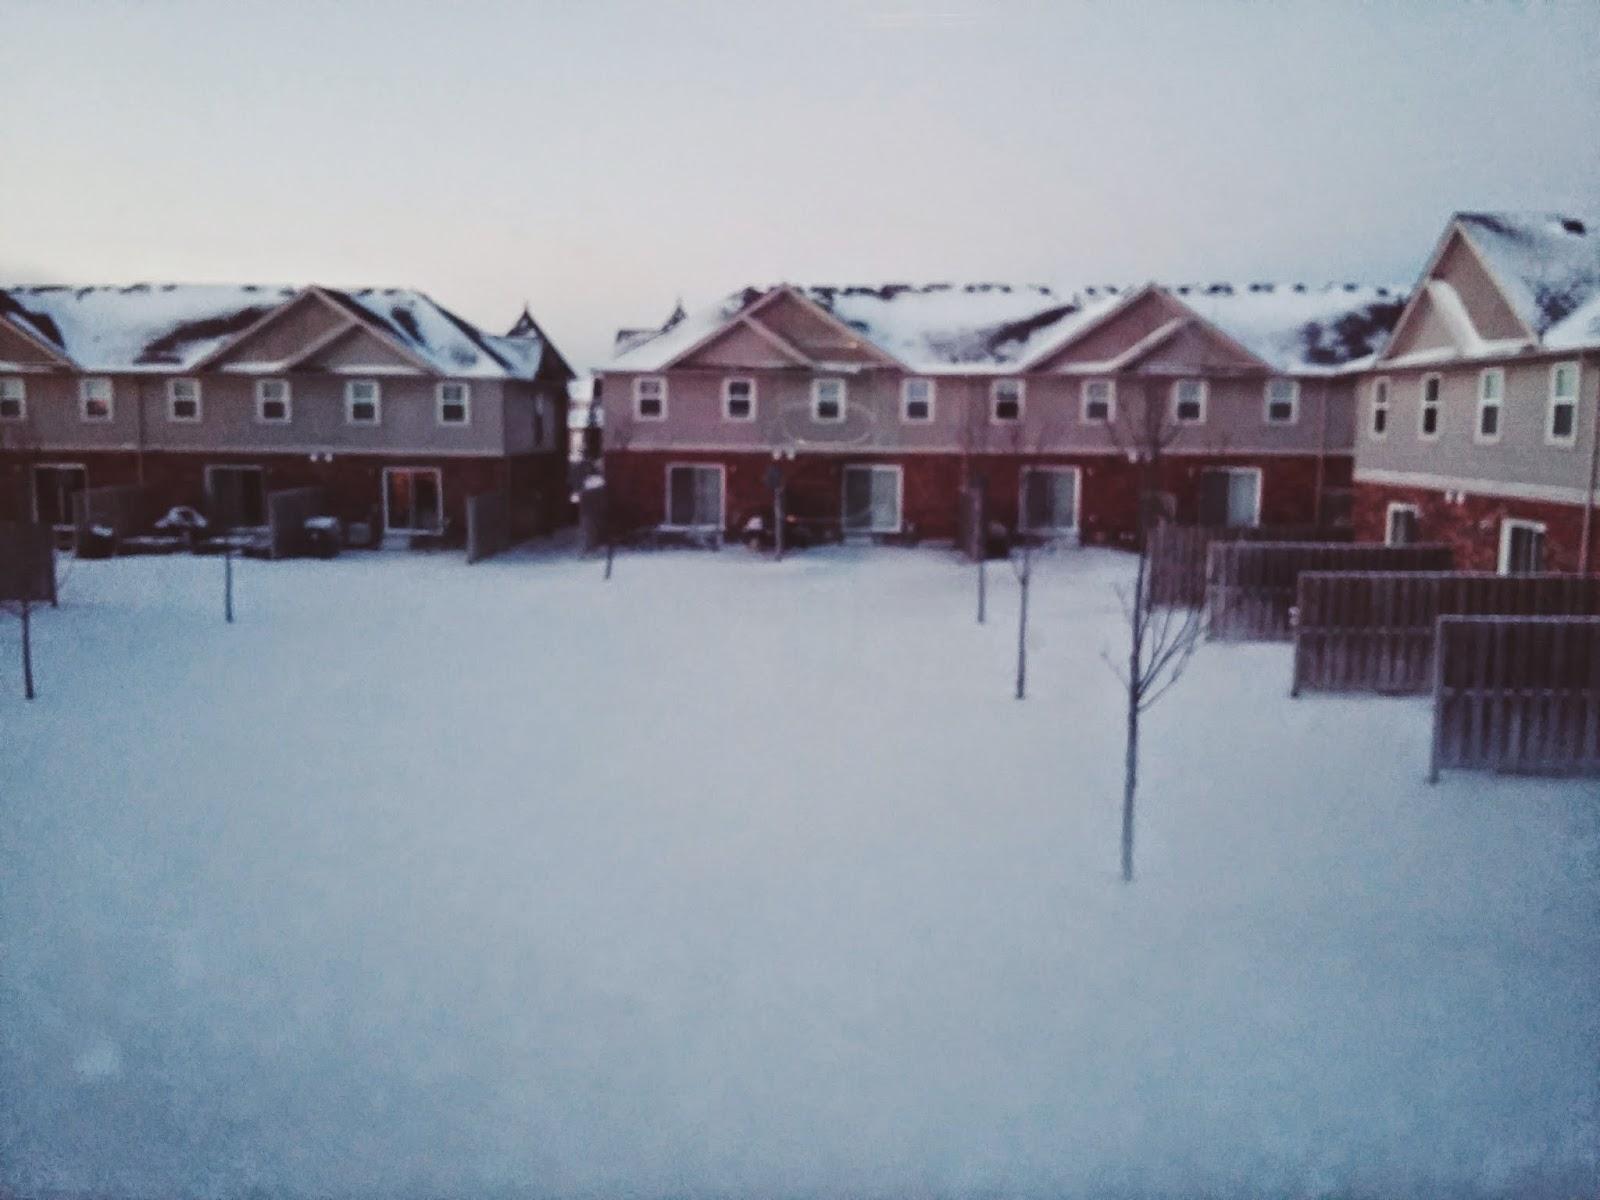 Frozen land oh frozen land